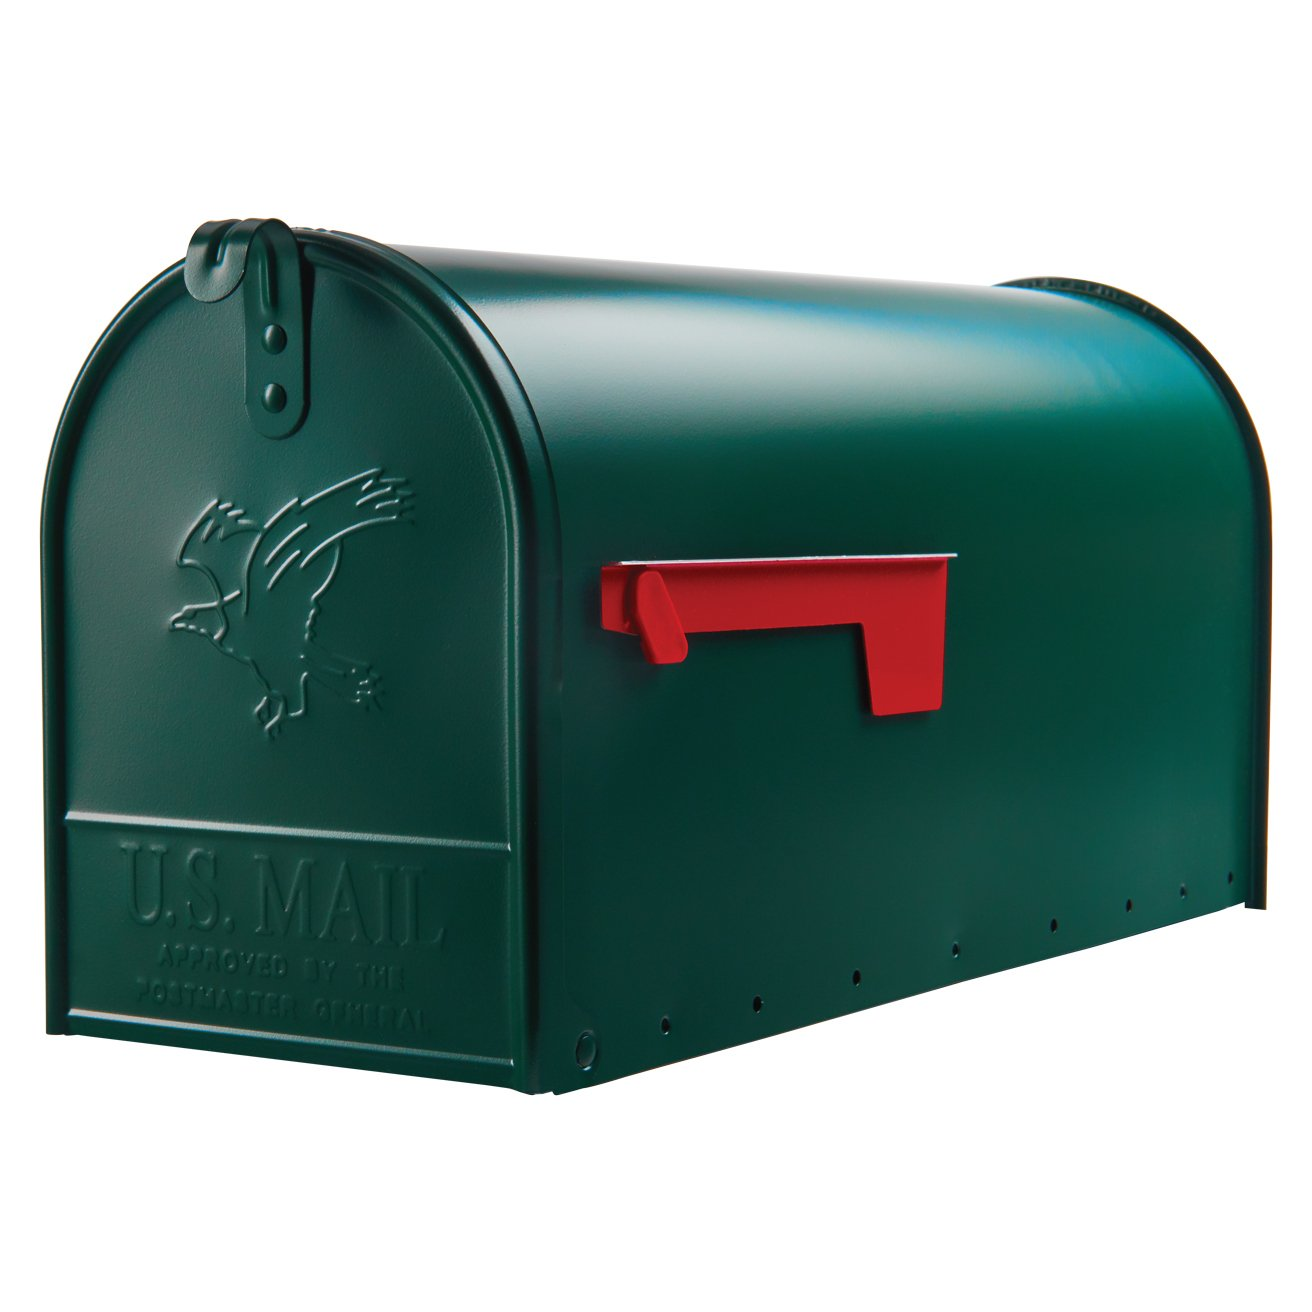 Gibraltar Mailboxes Elite Large Capacity Galvanized Steel Green, Post-Mount Mailbox, E1600G00